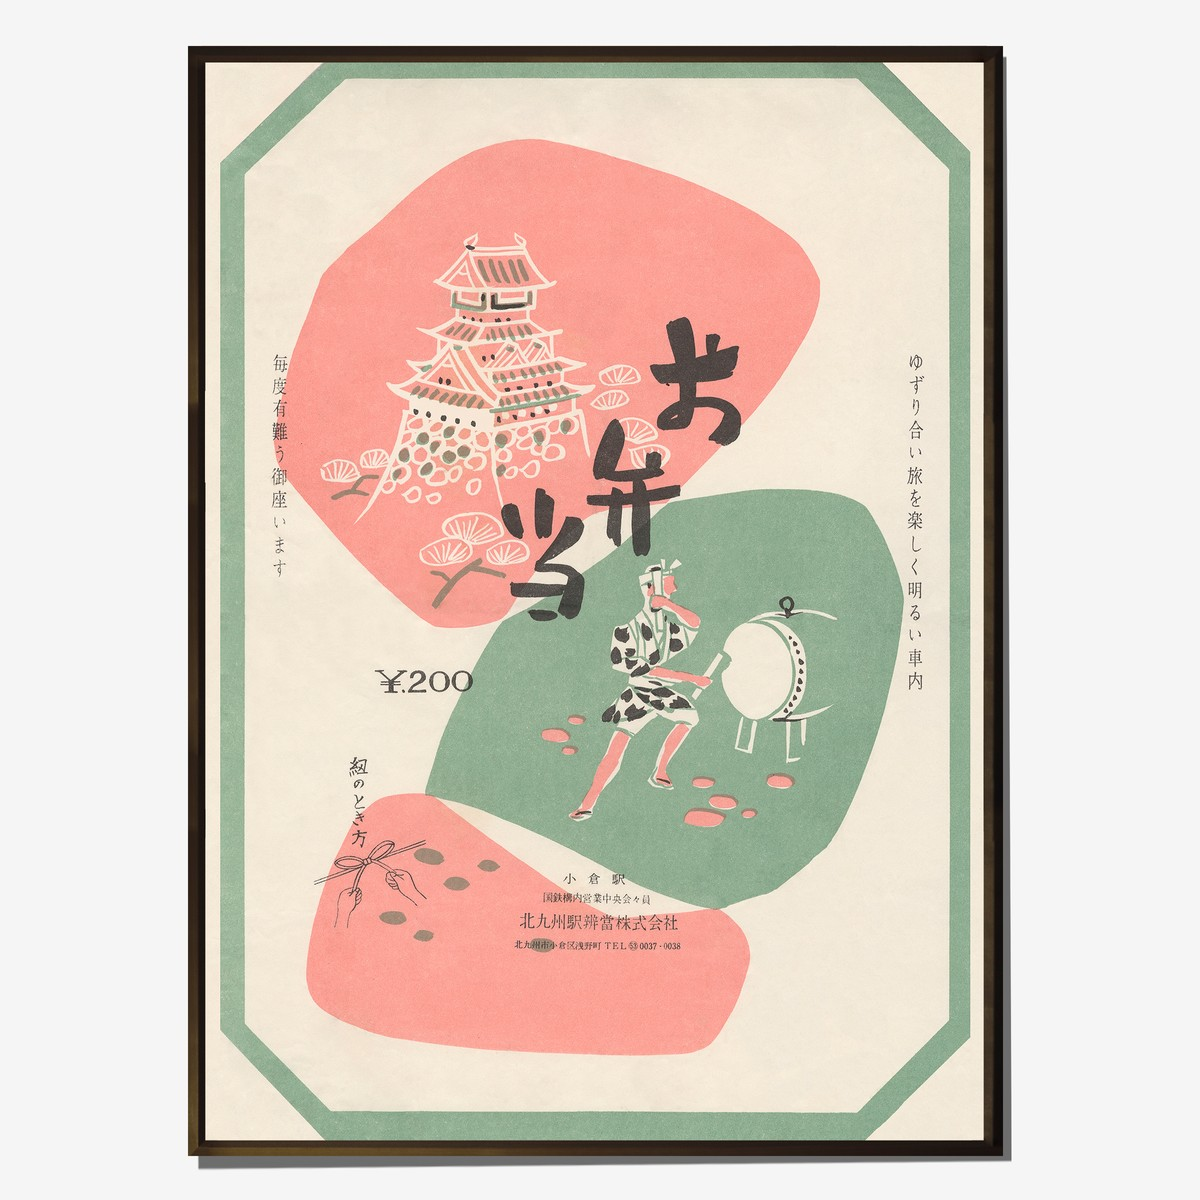 Photo of Kitakyushu by Train Vintage Advertising Poster